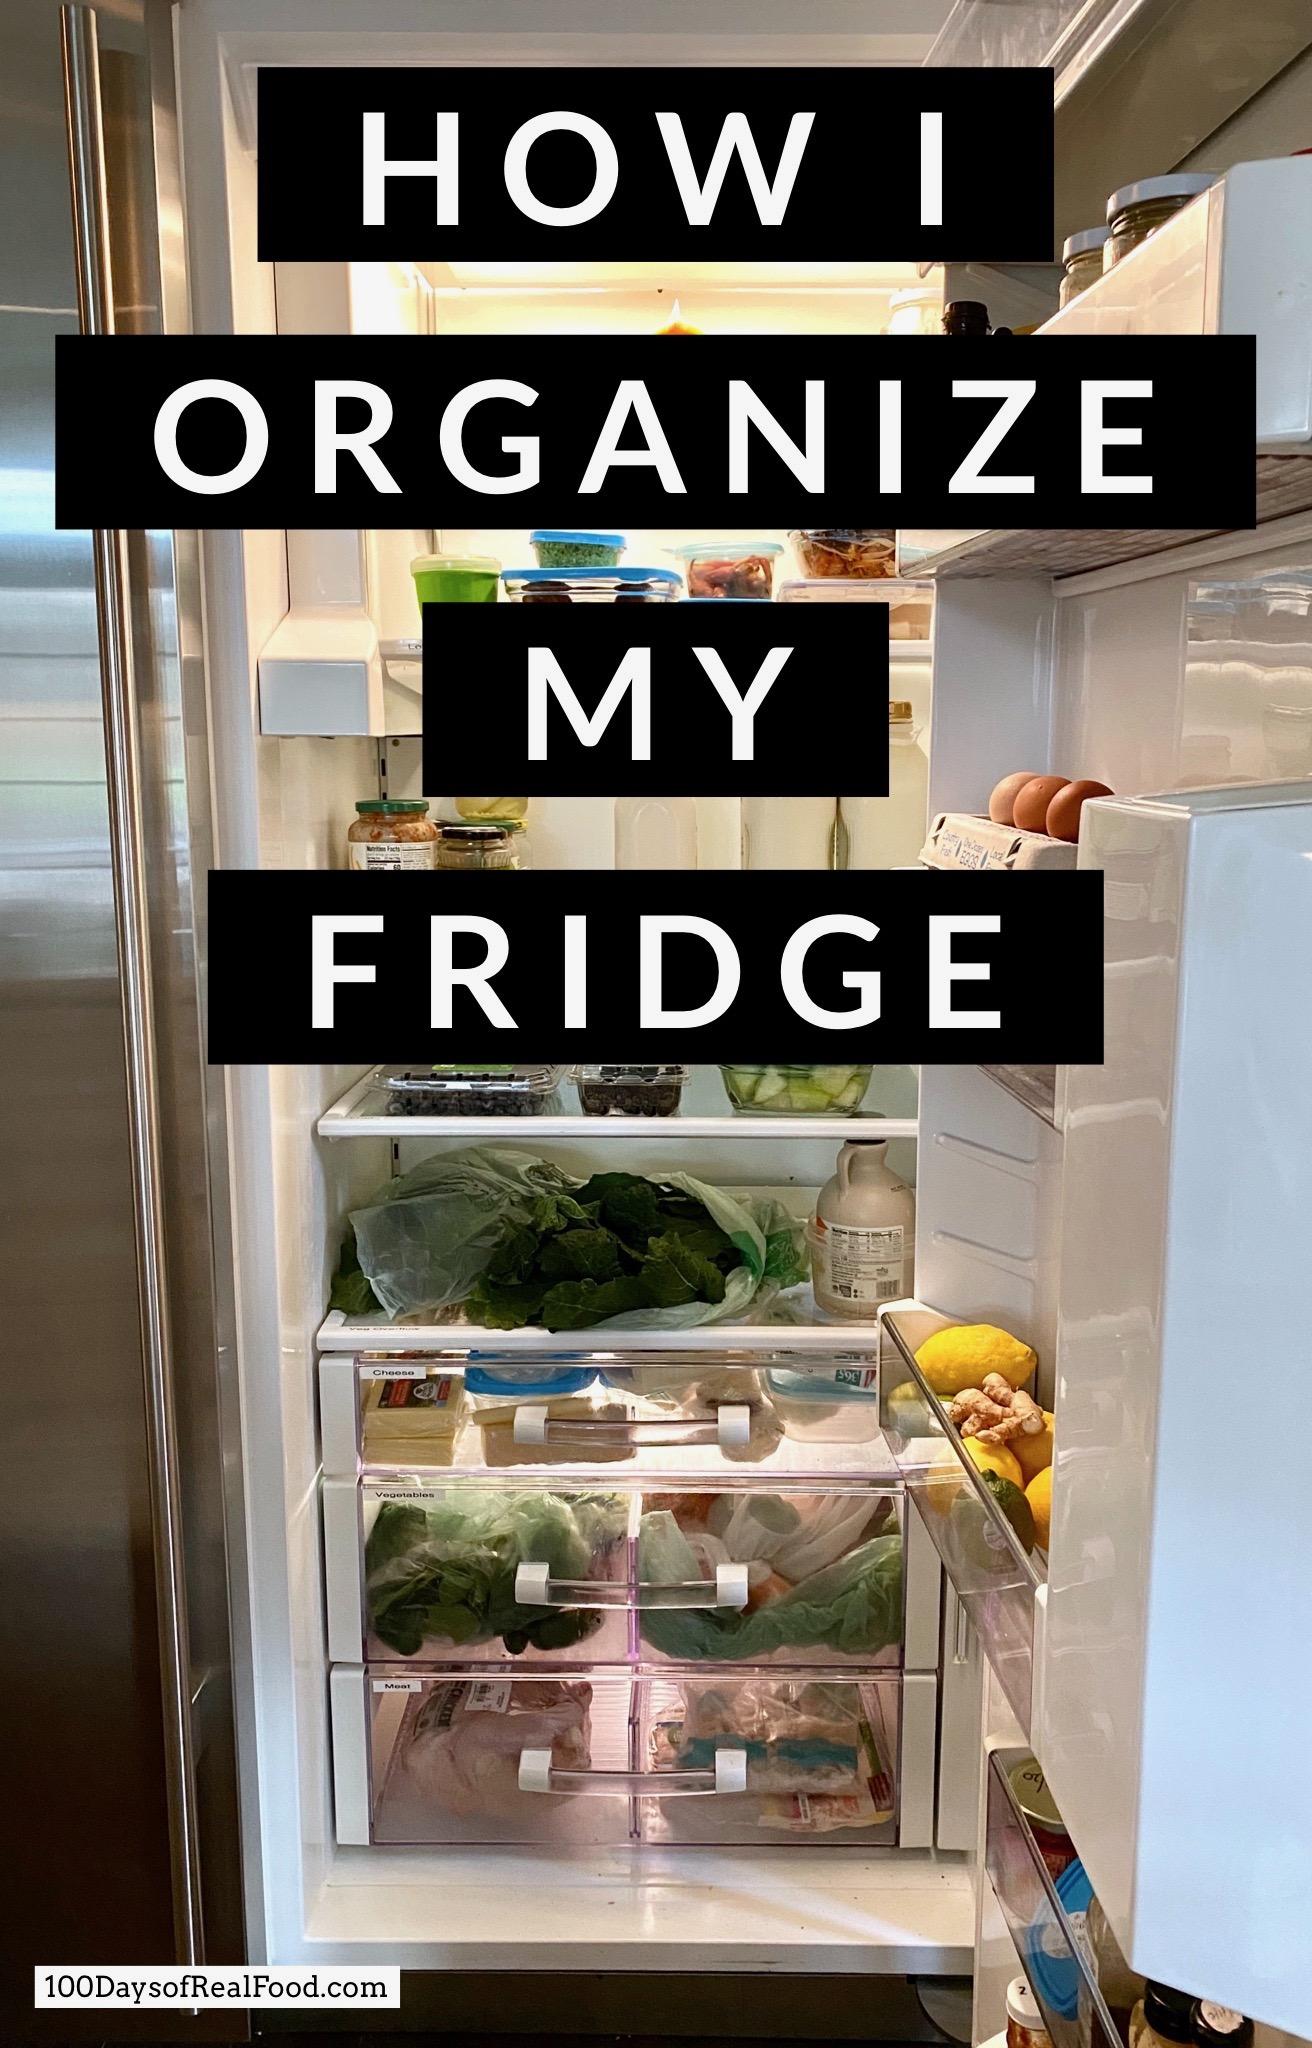 How I organize my fridge on 100 Days of Real Food